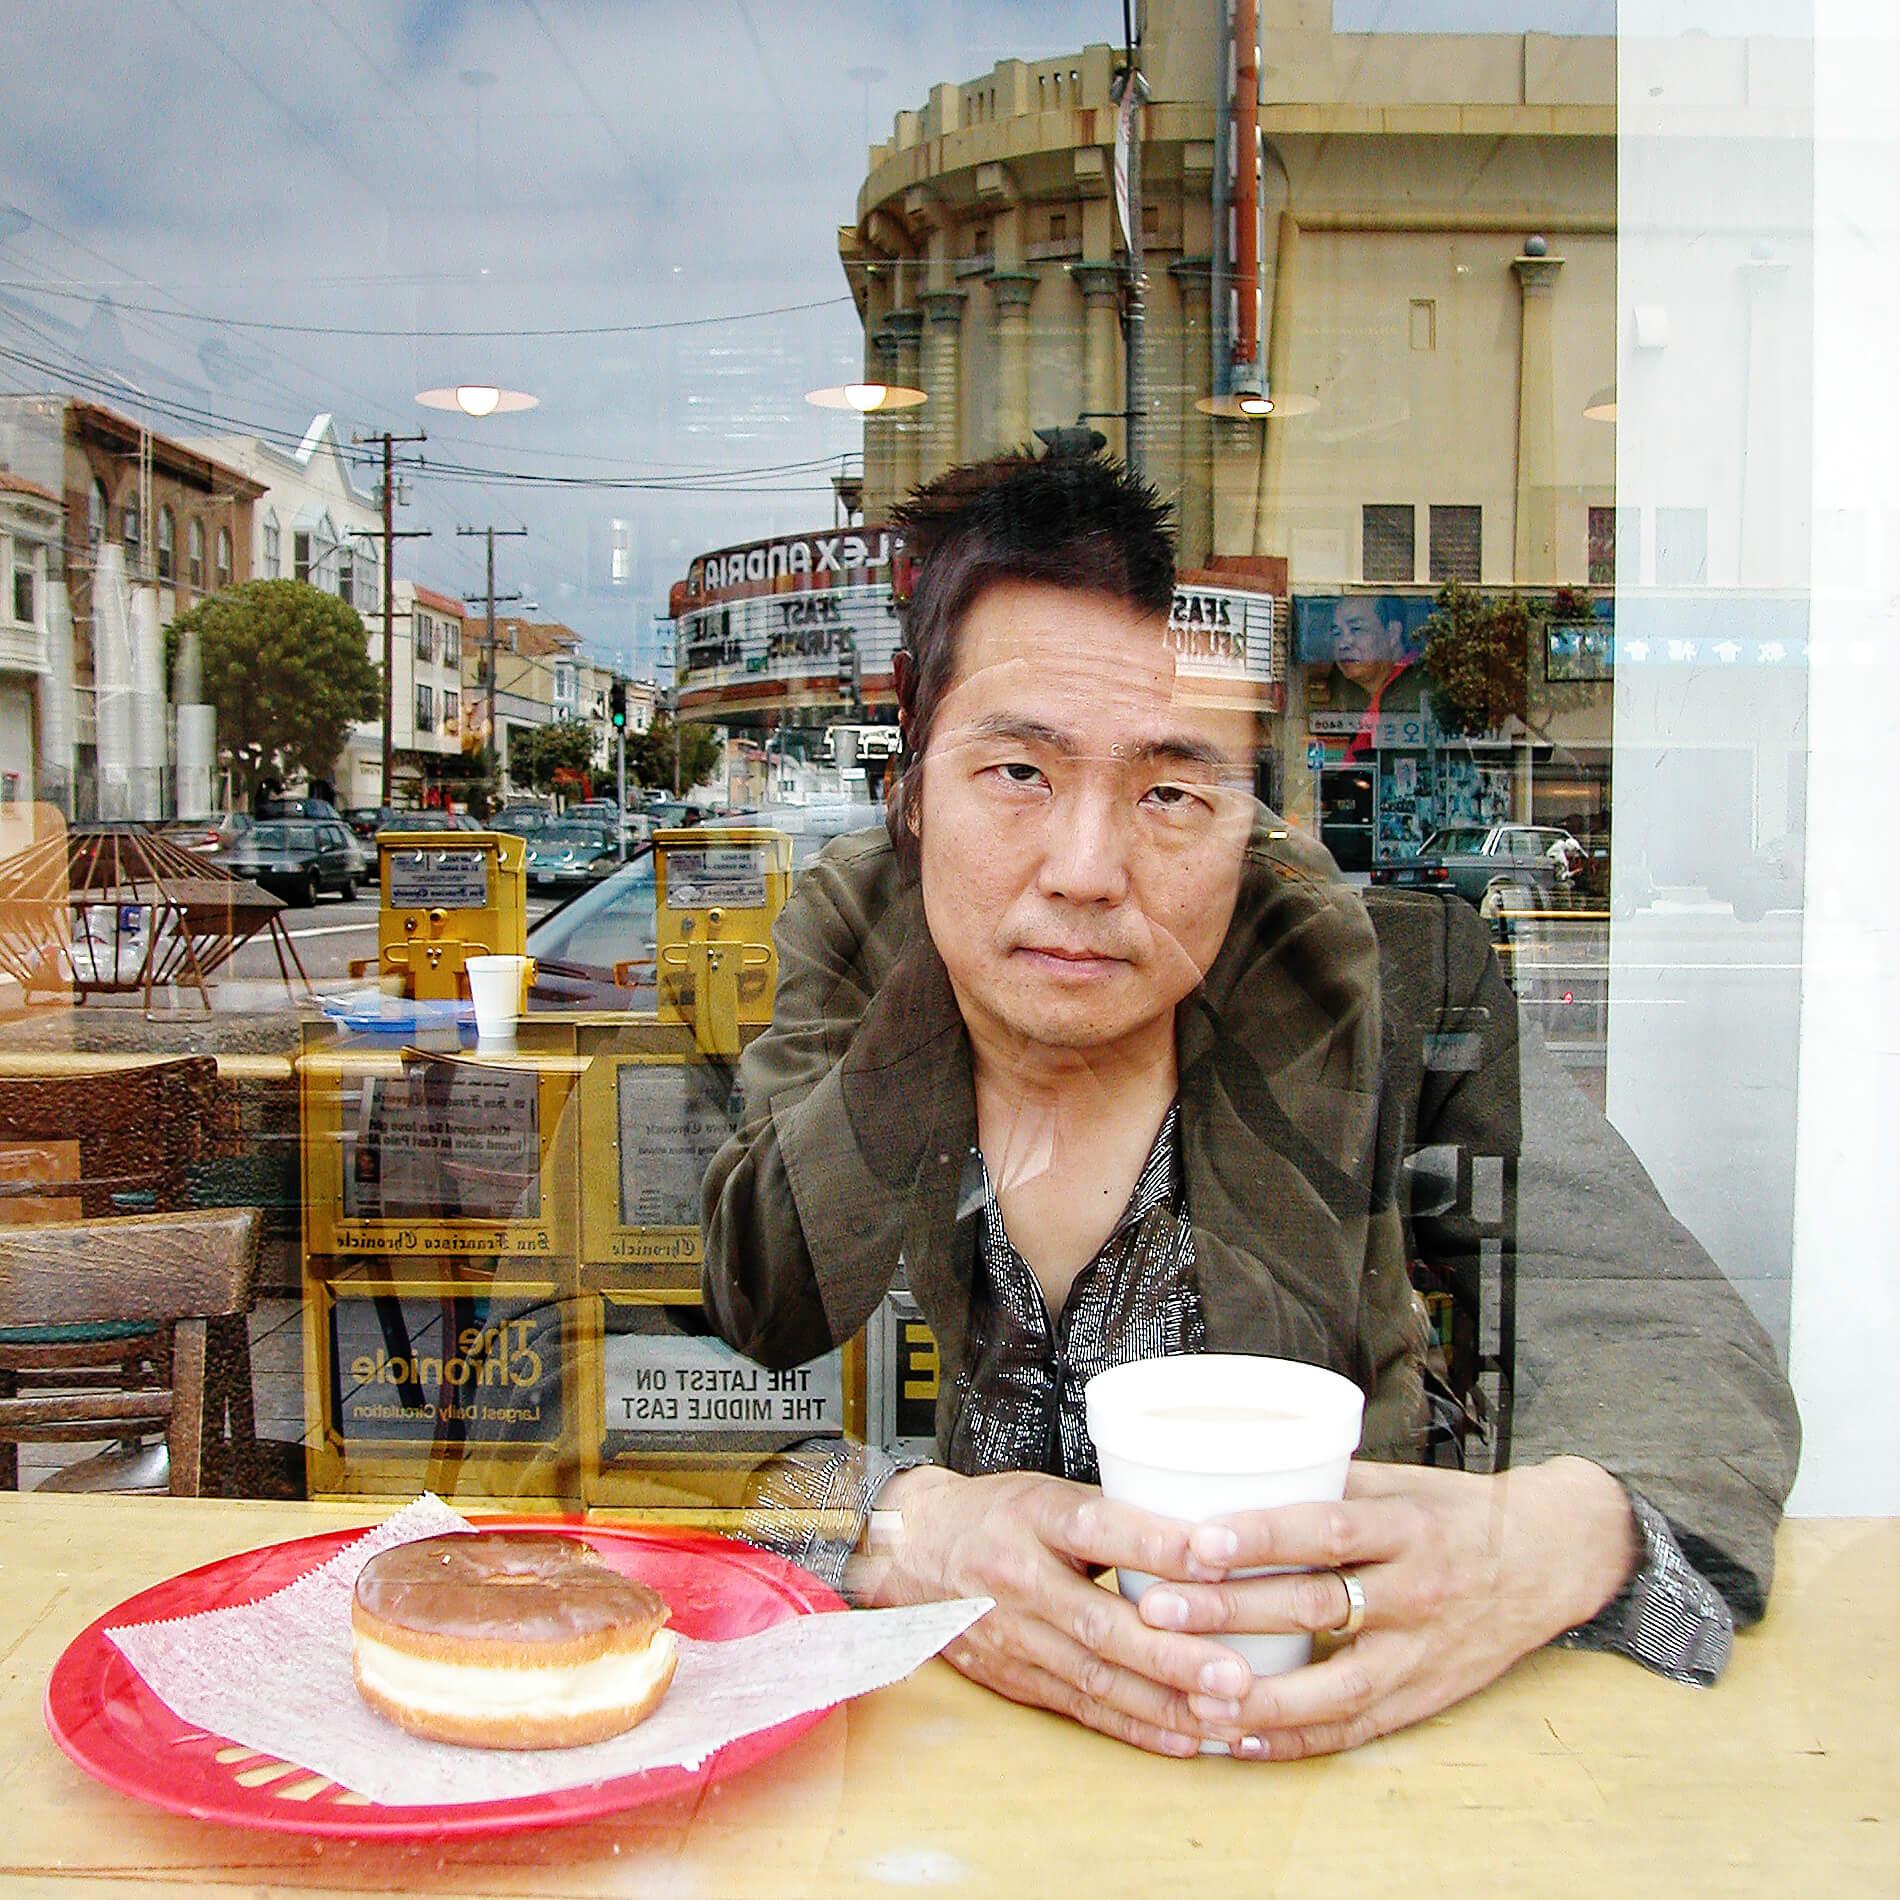 Filmmaker Jon Moritsugu